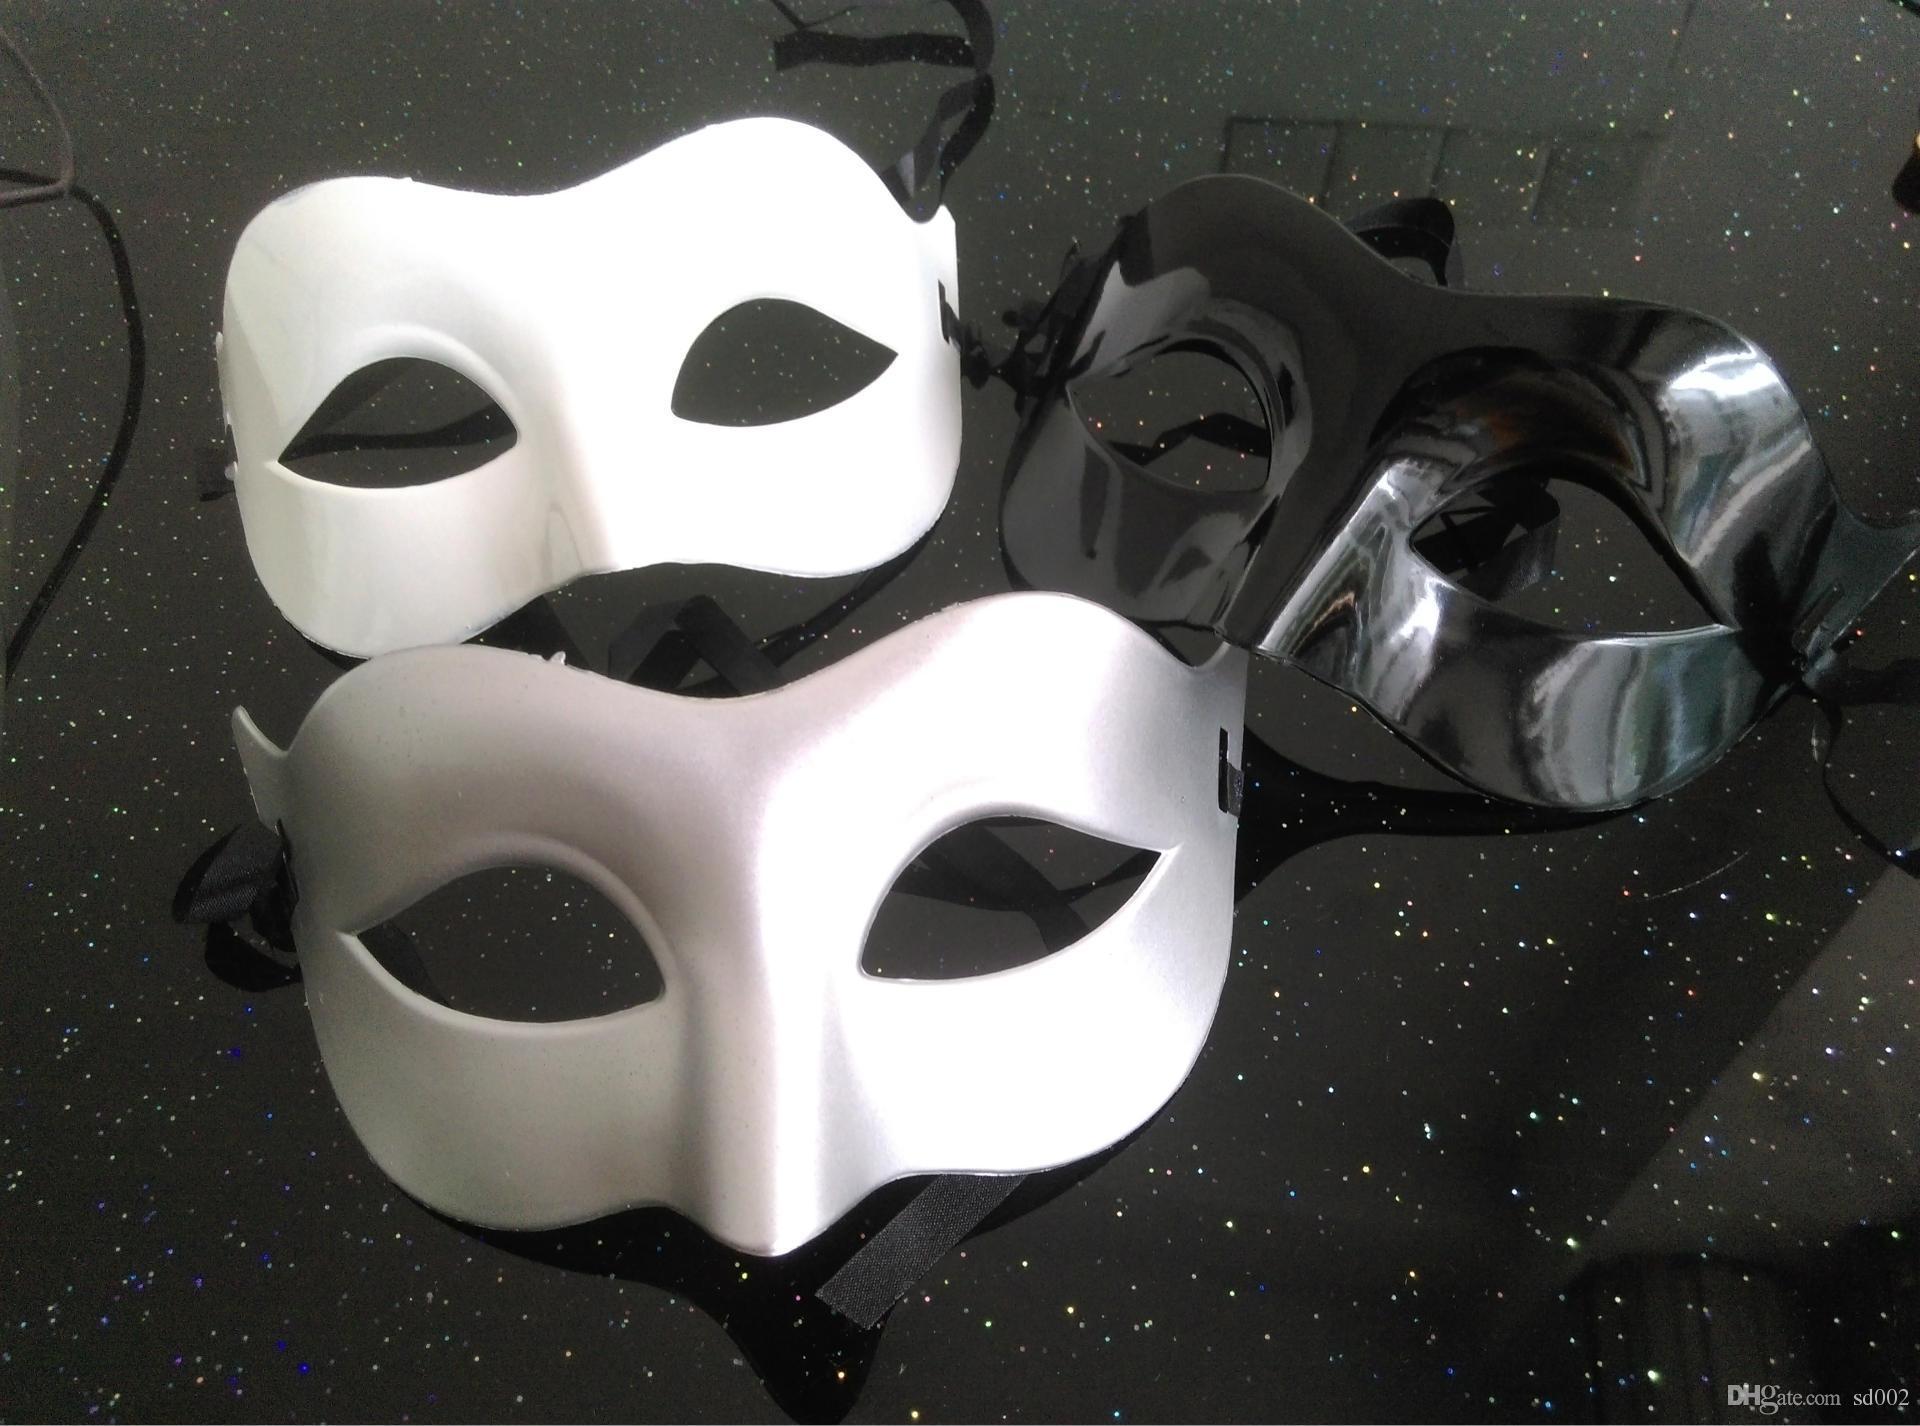 Man Half Face Mask Many Colors Halloween Unisex Party Venetian Masquerade Decorations Mardi Gras Masks Hot Sell 0 9rh J Masks Costume Masks Costumes From ... & Man Half Face Mask Many Colors Halloween Unisex Party Venetian ...